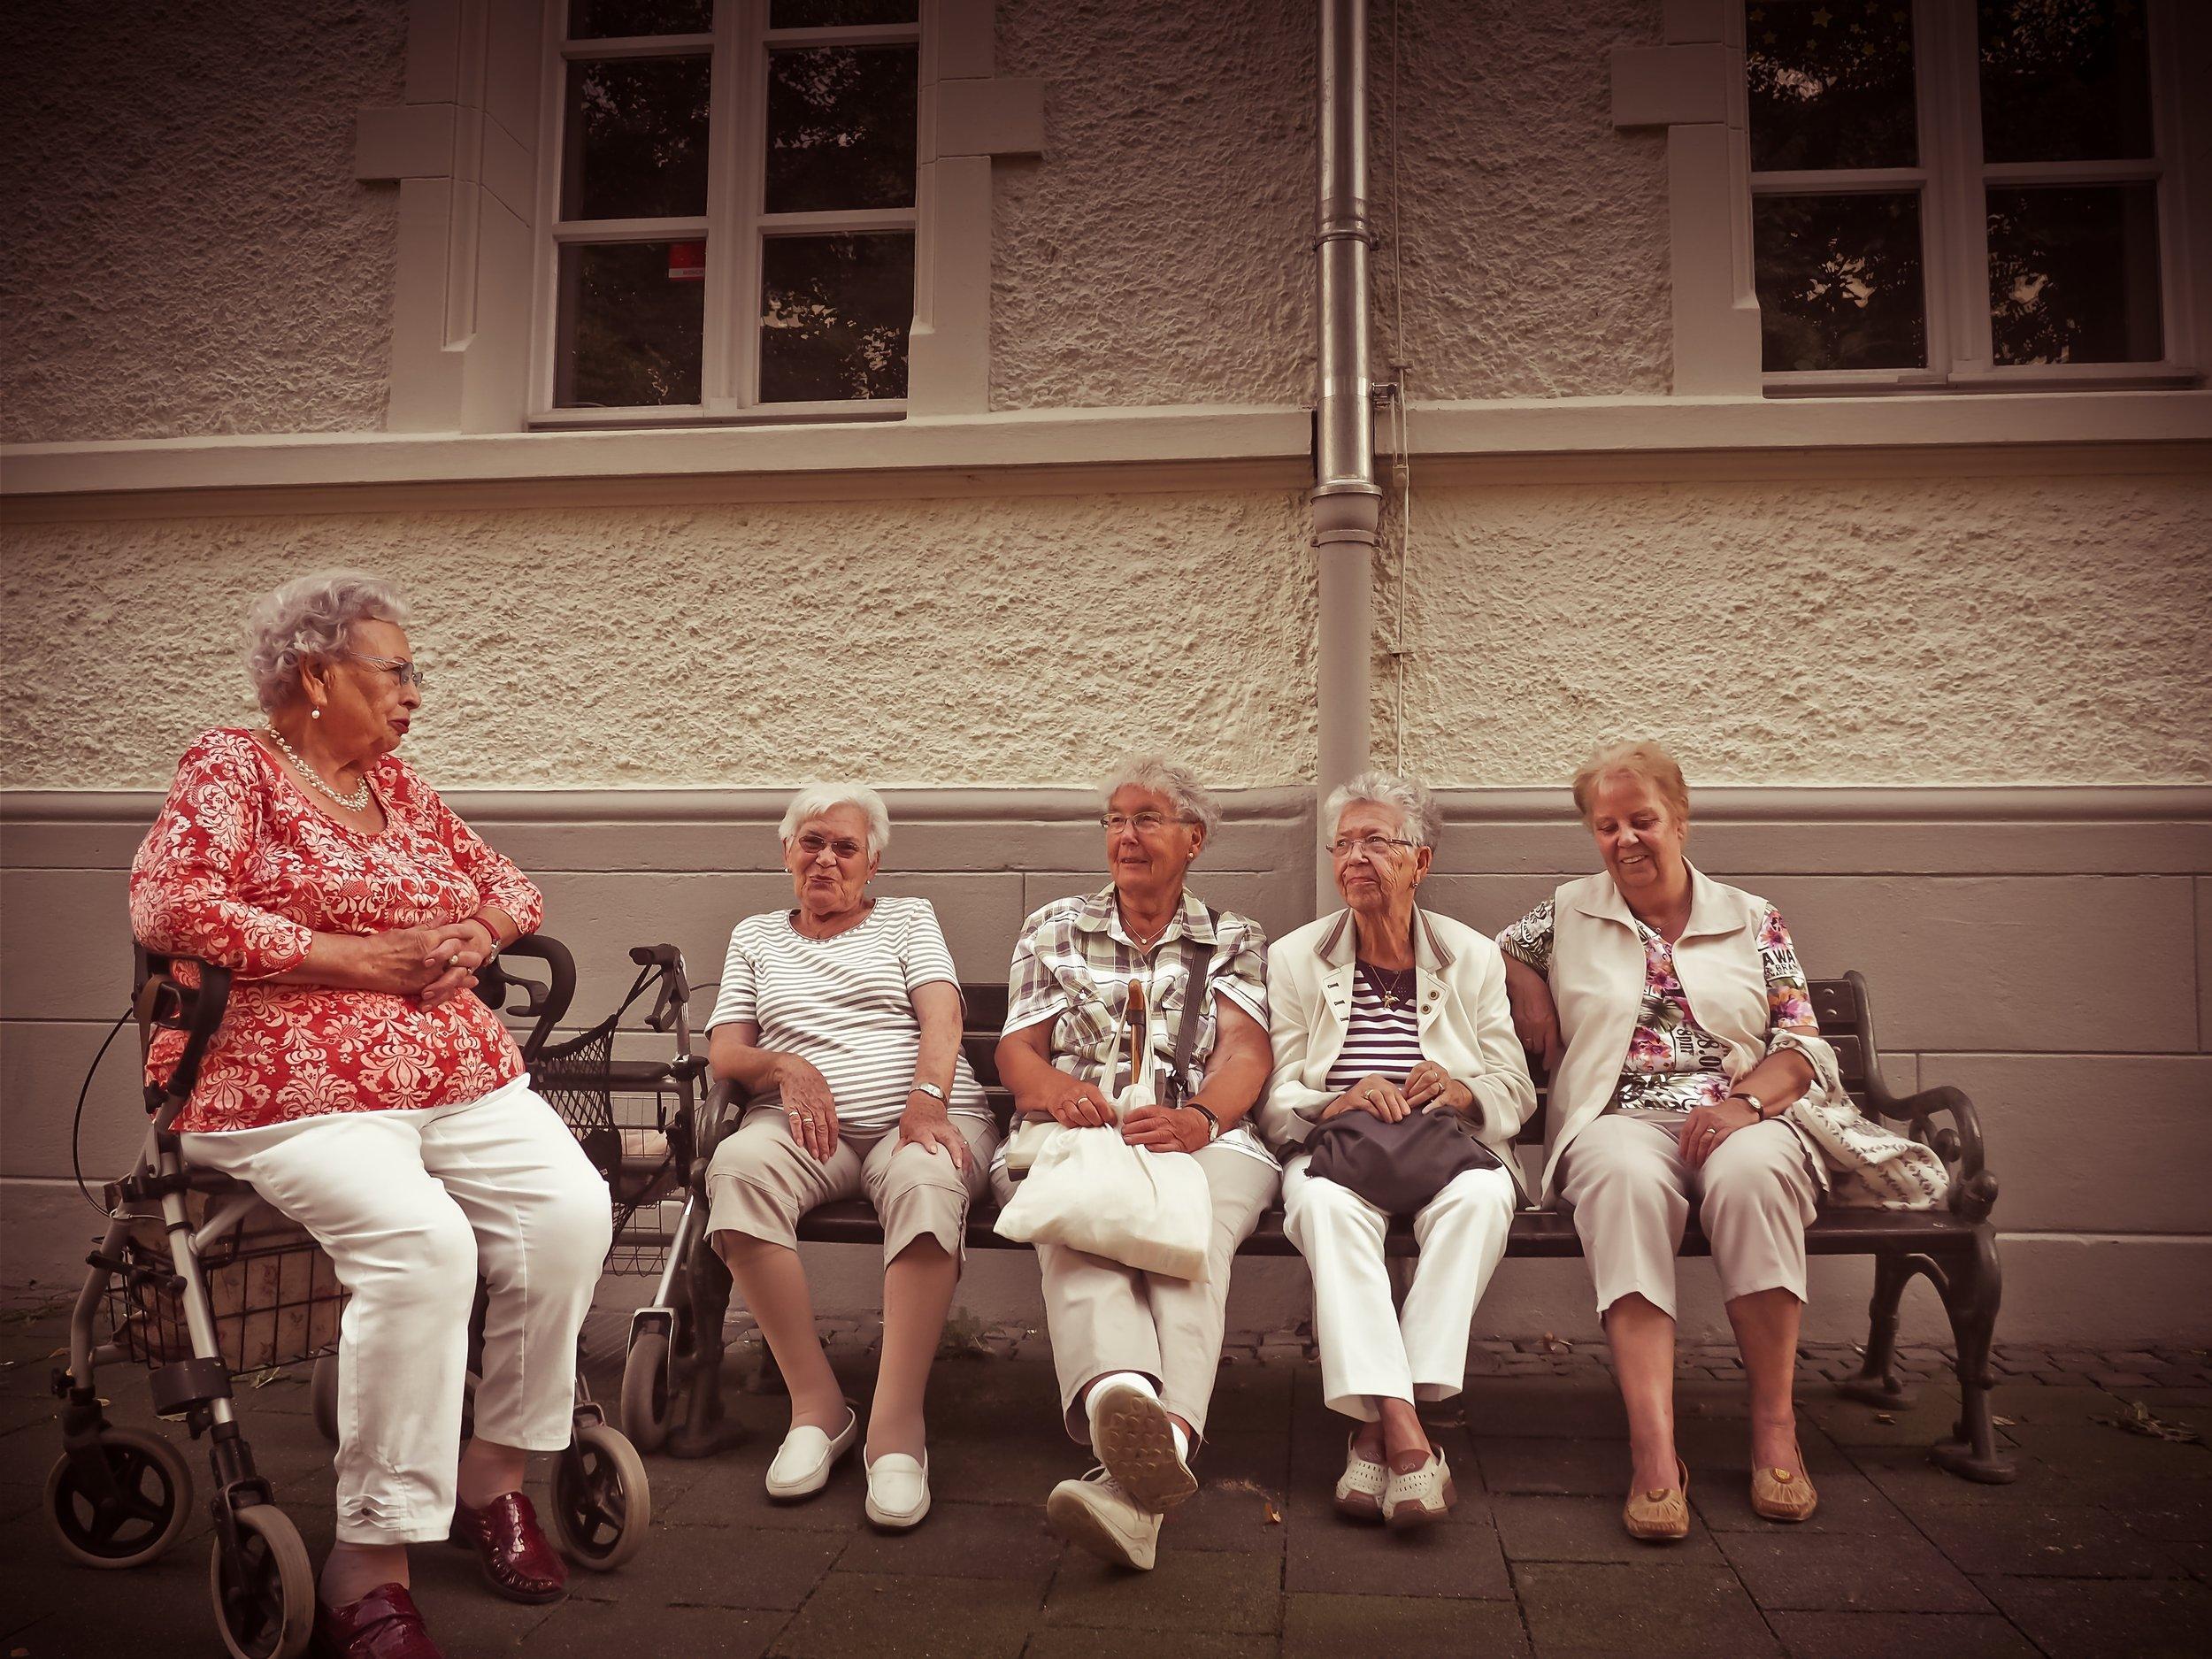 adult-age-elderly-272864.jpg